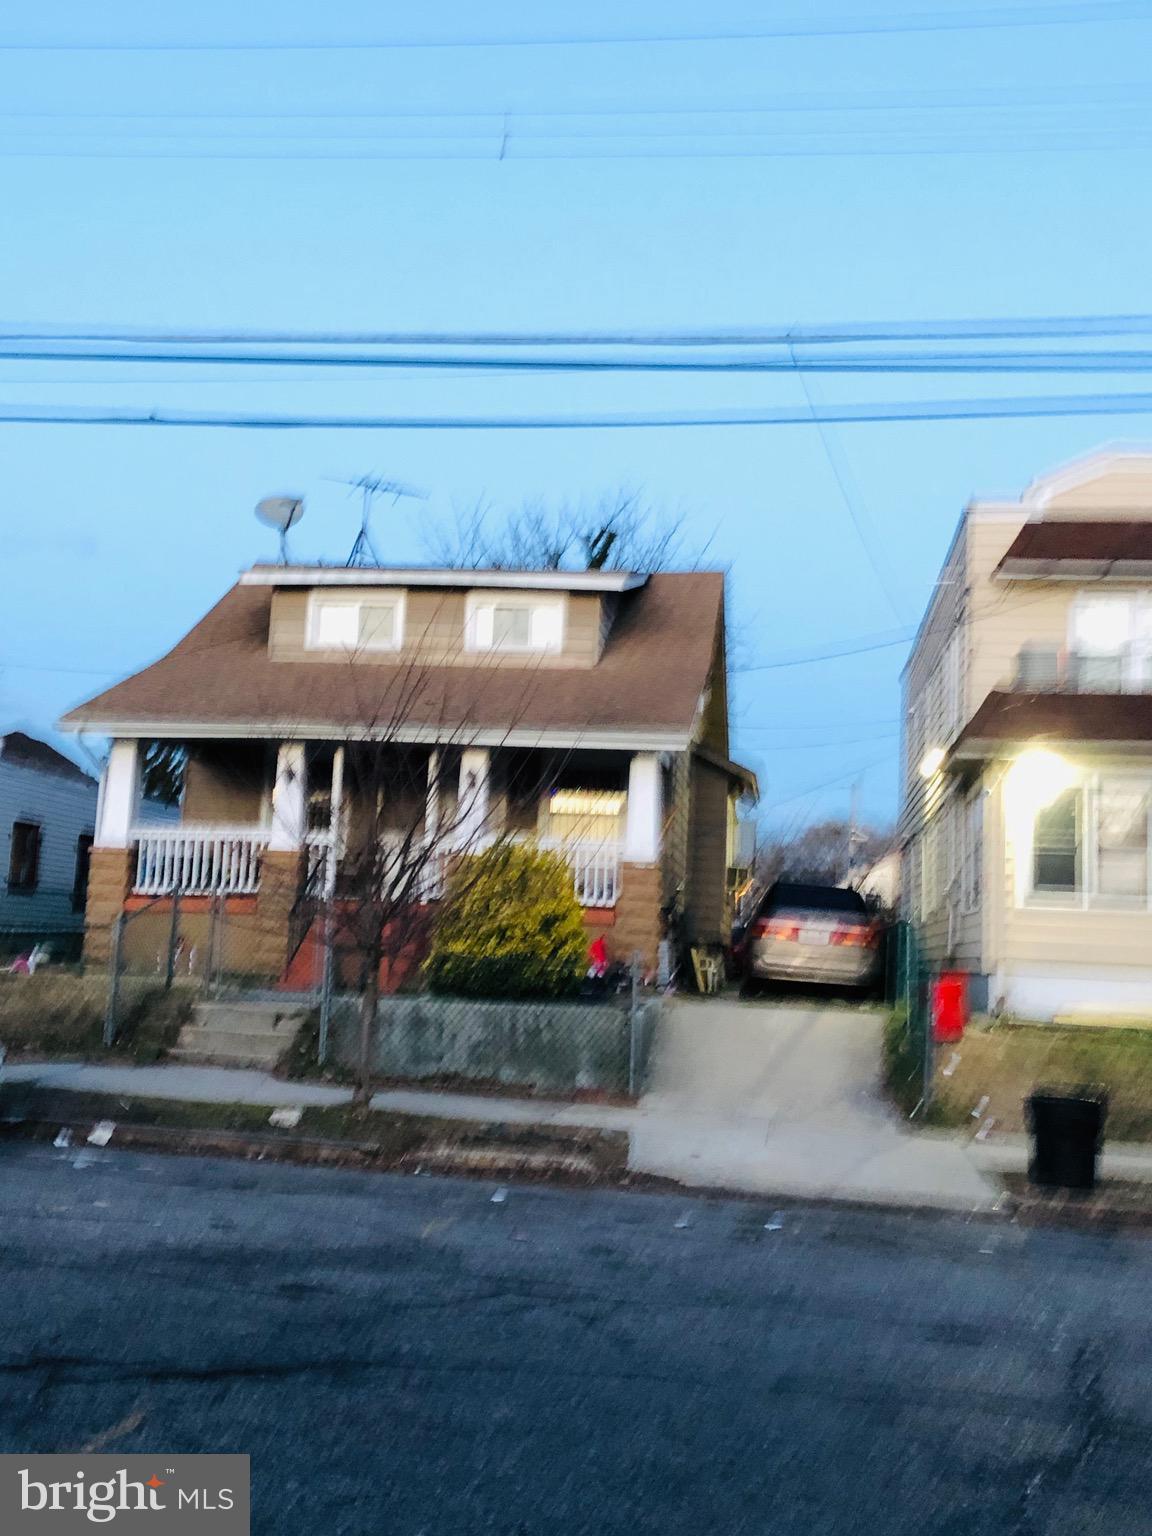 556 N 34TH STREET, CAMDEN, NJ 08105